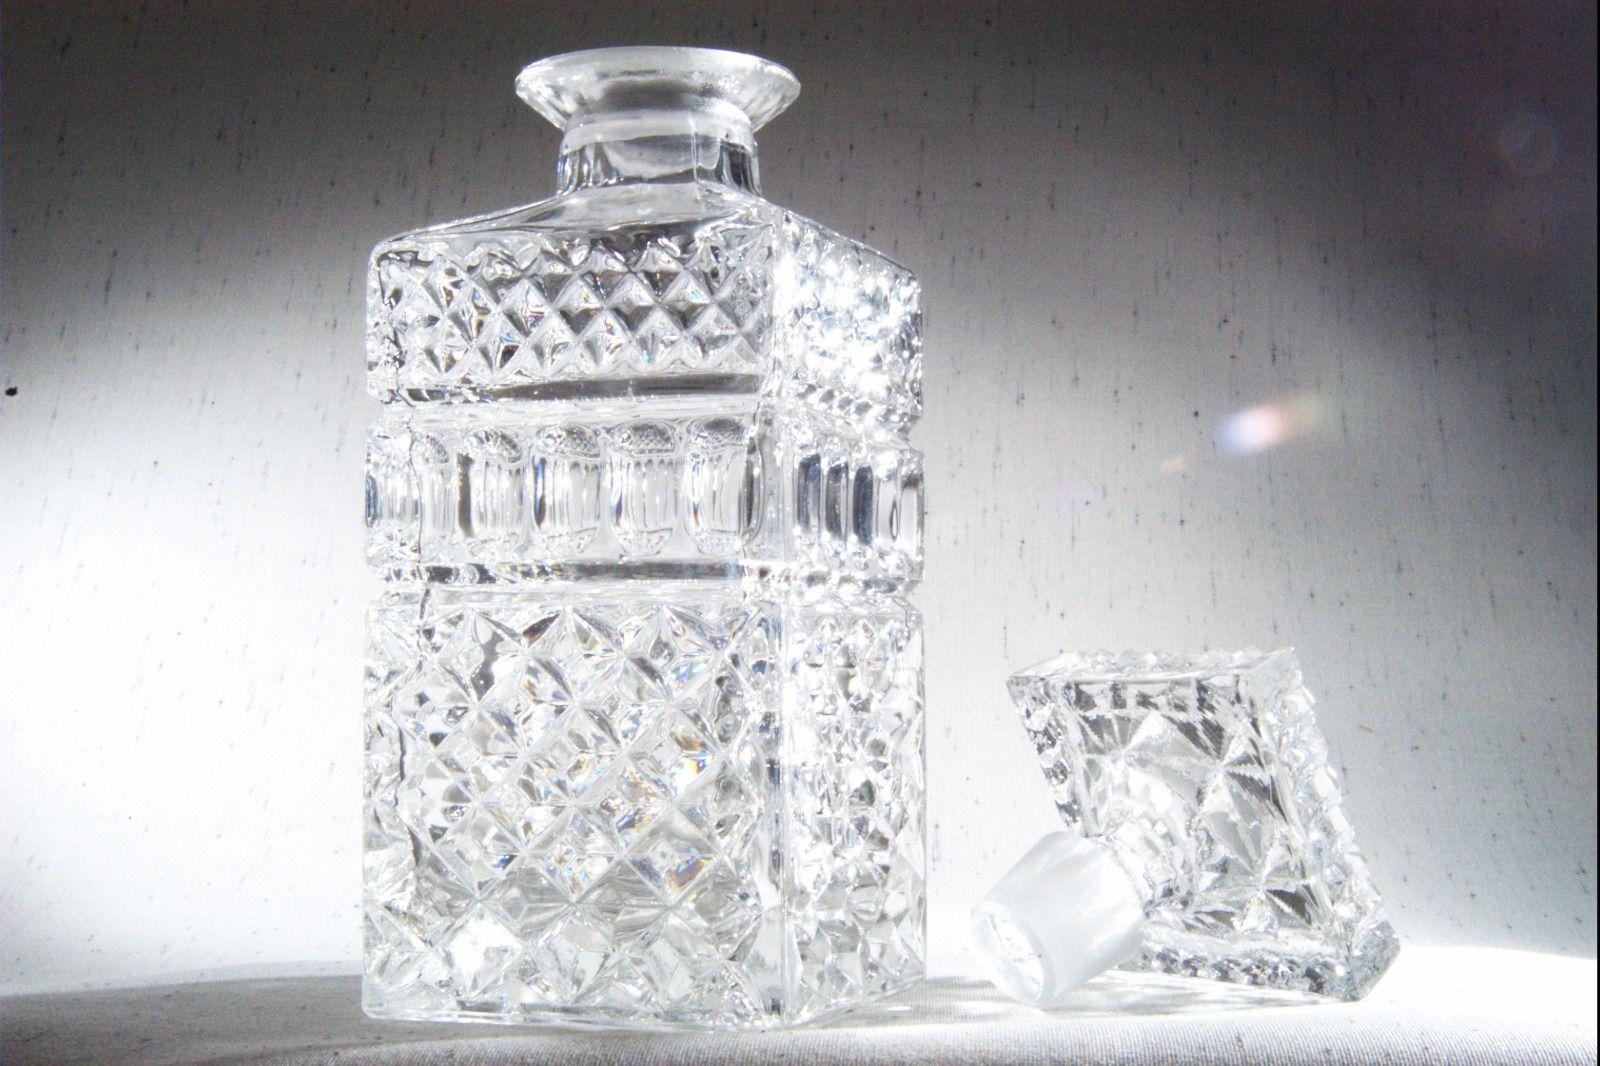 bleikristall karaffe ddr 80er jahre lausitzer whisky whiskey kristall handgeschl ebay eur 49. Black Bedroom Furniture Sets. Home Design Ideas